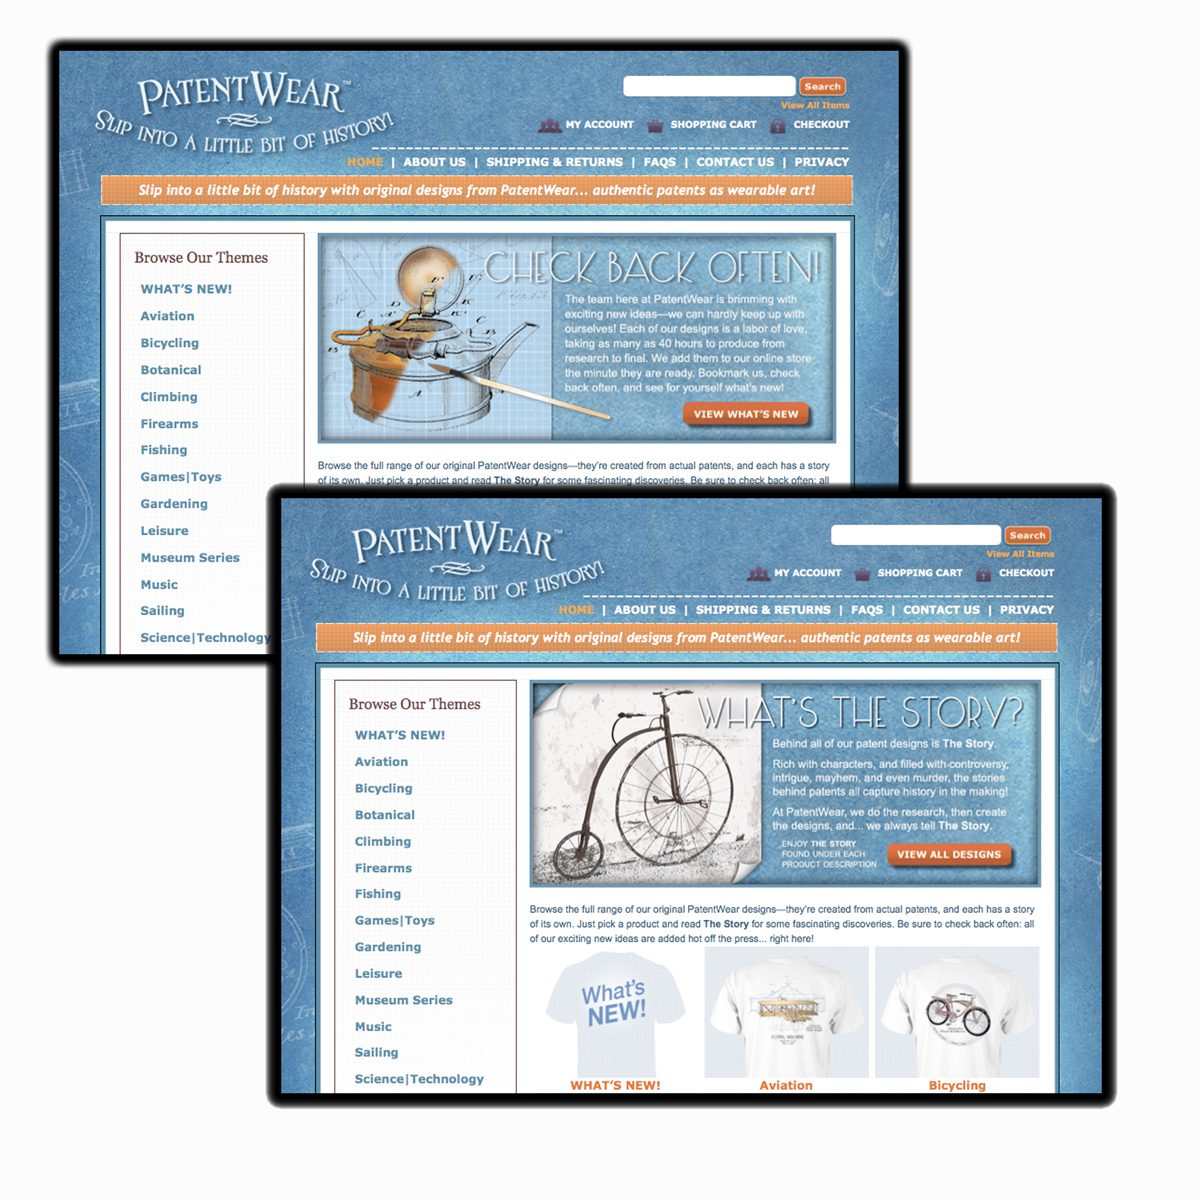 Web banners in position on PatentWear.com website